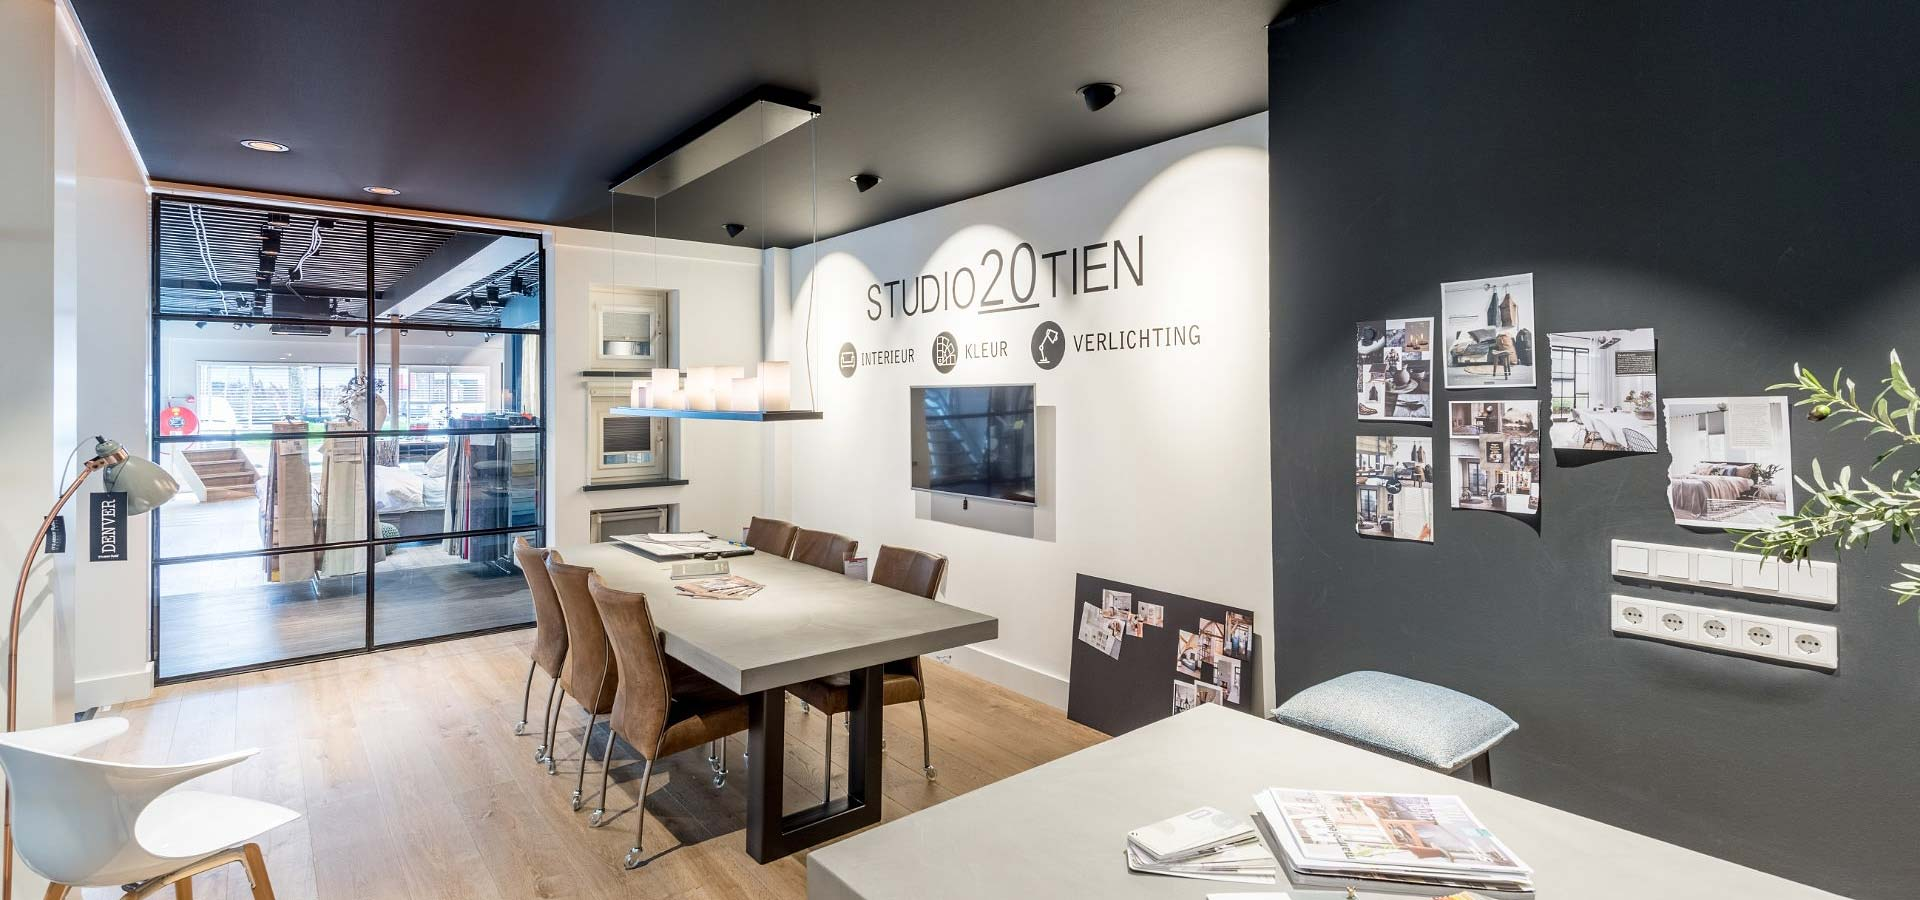 Büro Besprechungsraum - Decke Gewerbe Restaurant Hotel Siegen